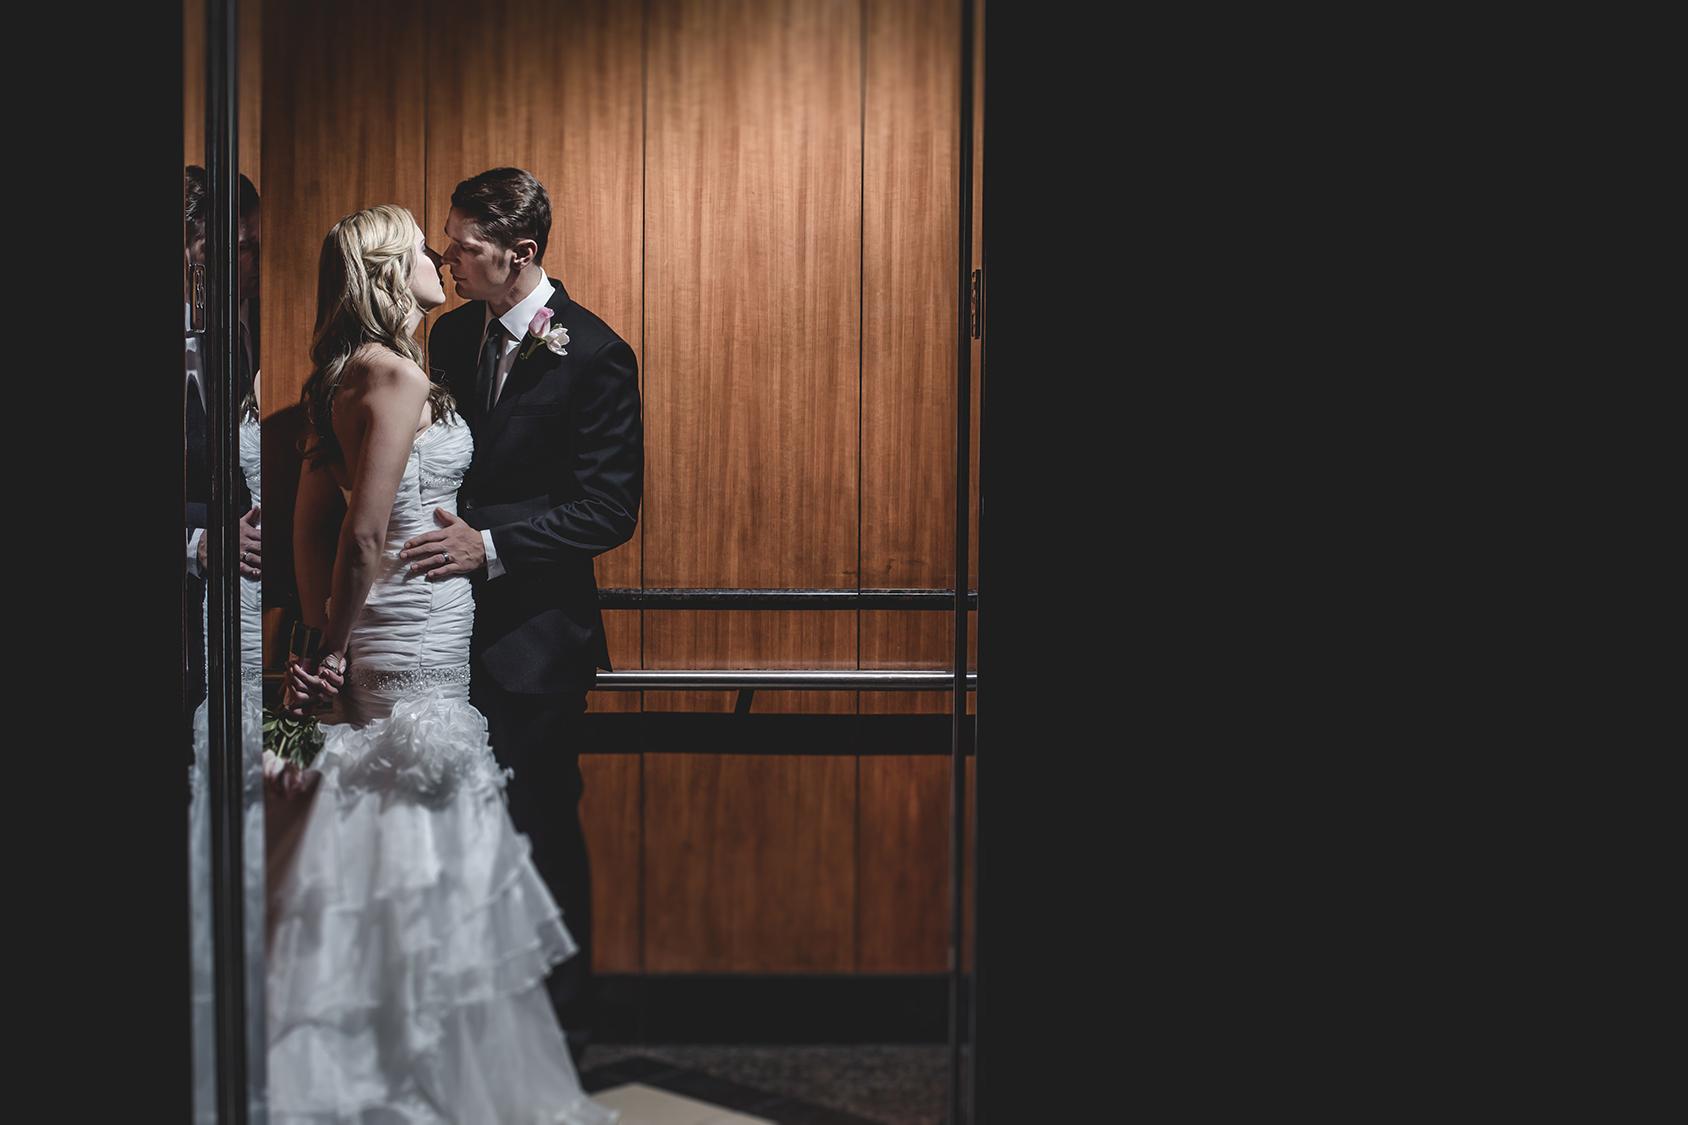 adam-szarmack-wedding-bride-groom-elevator.jpg